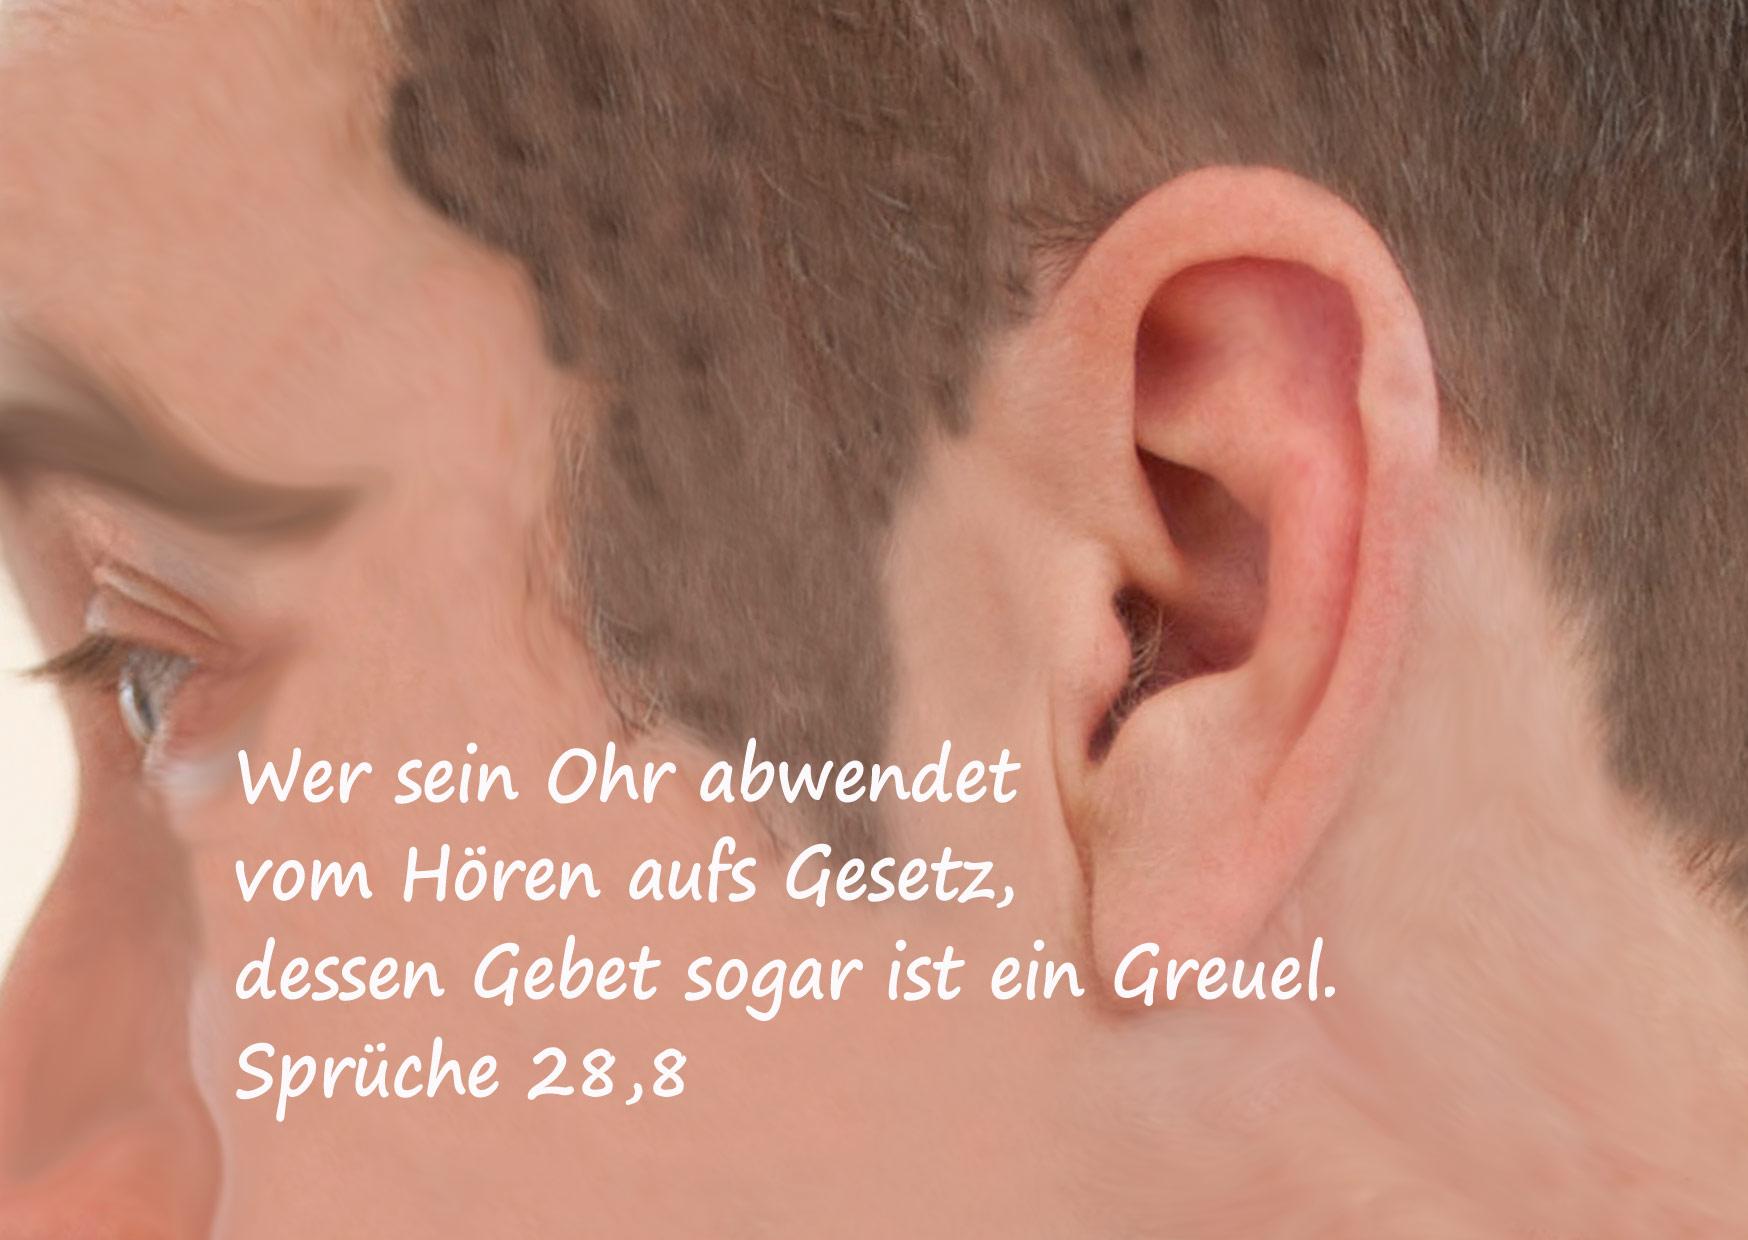 Bibelzitat, Sprüche 28,8, Ohr, Bild: Danzer, Christine, go 4 Jesus, Bibel